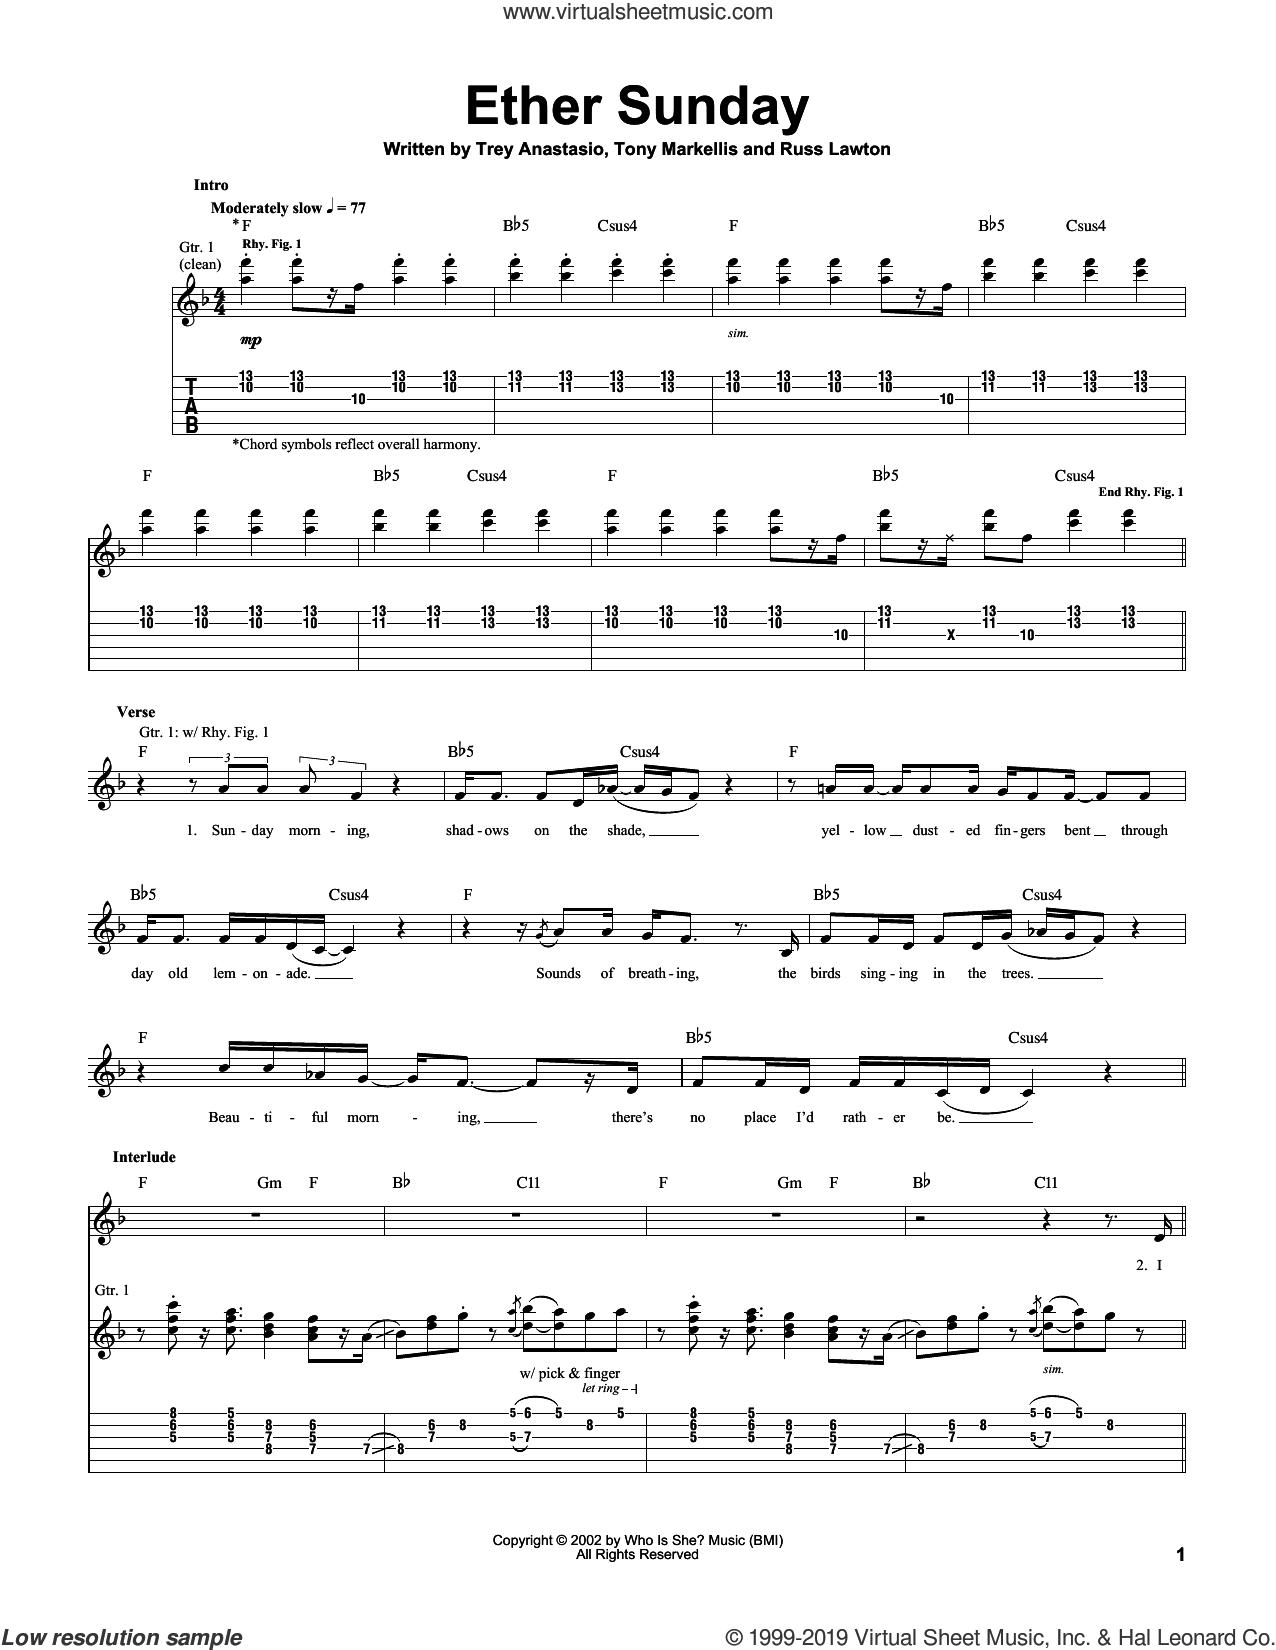 Ether Sunday sheet music for guitar (tablature) by Trey Anastasio, Russ Lawton and Tony Markellis, intermediate skill level